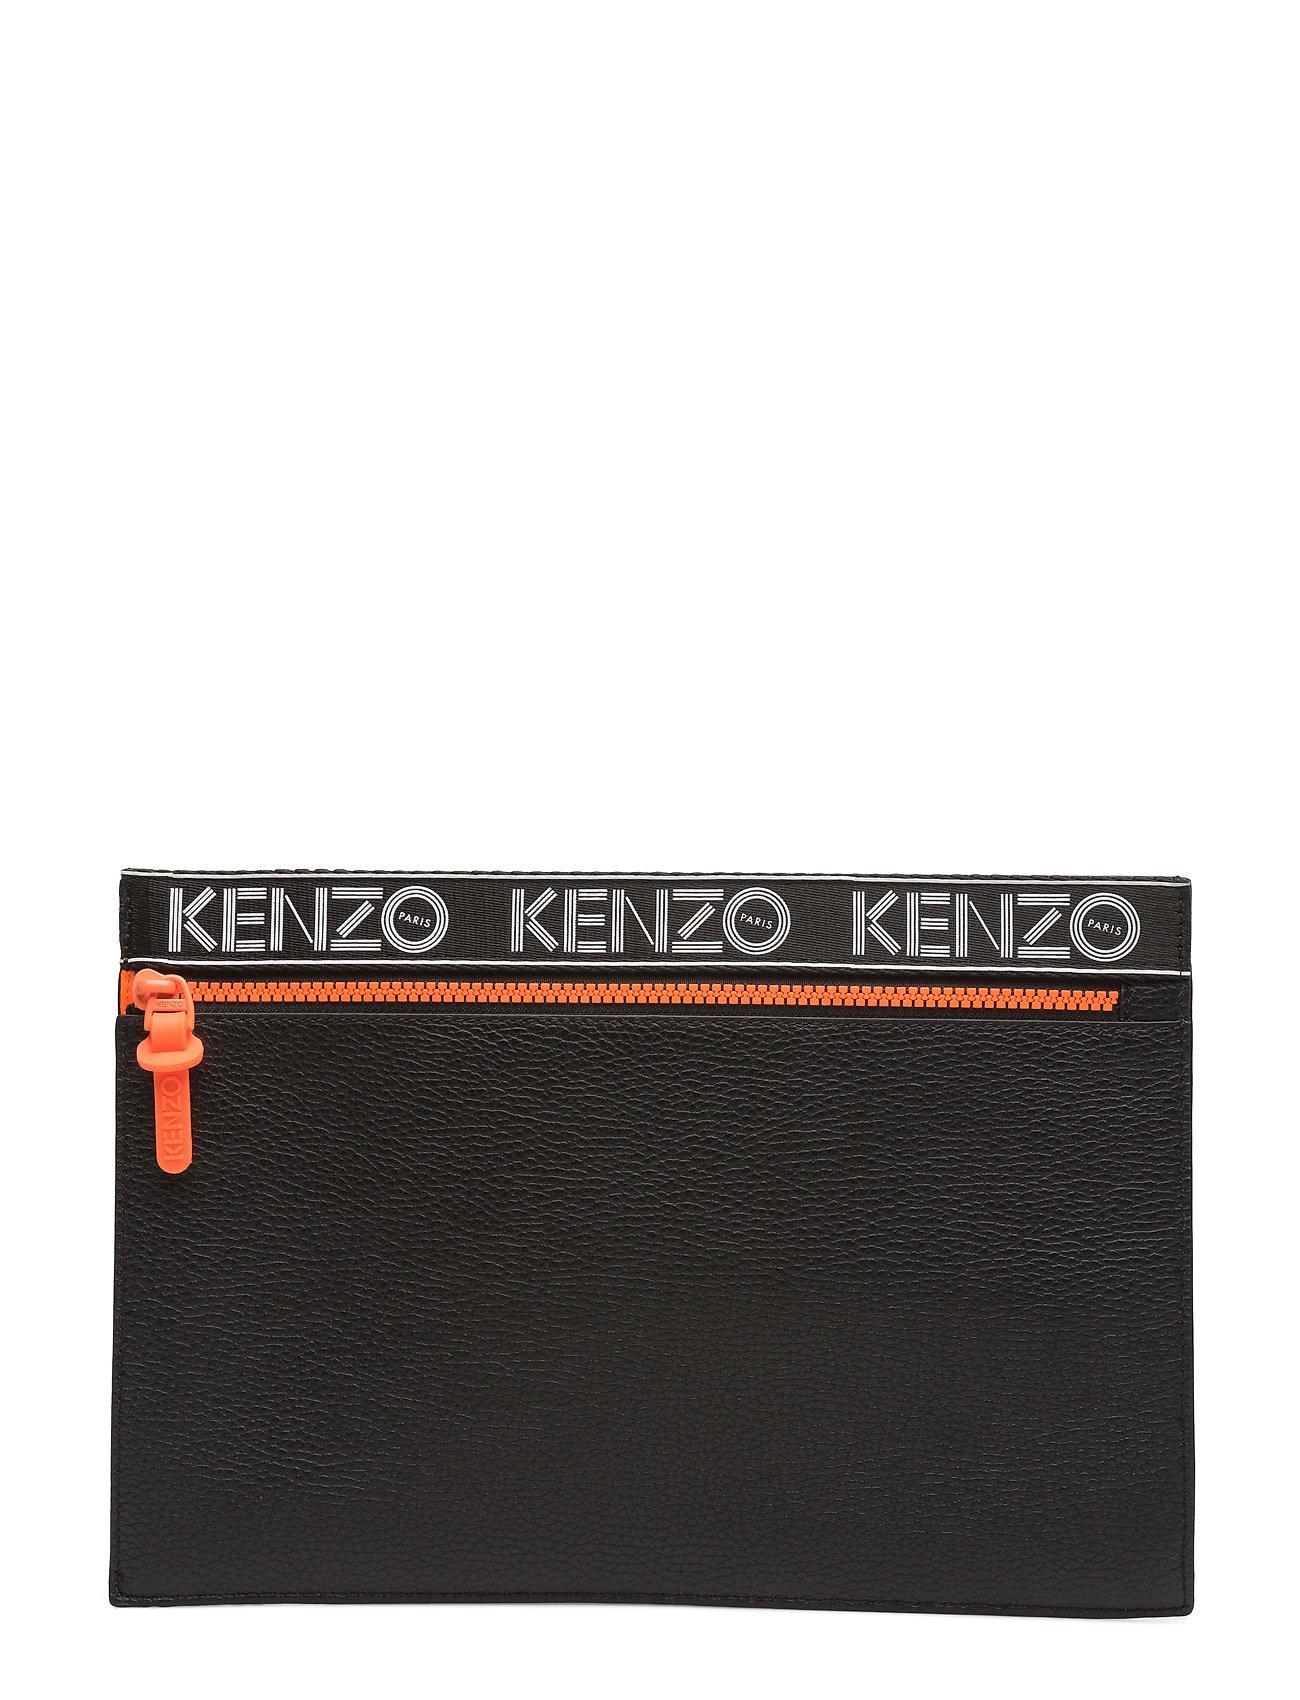 kenzo Clutch bag main fra boozt.com dk